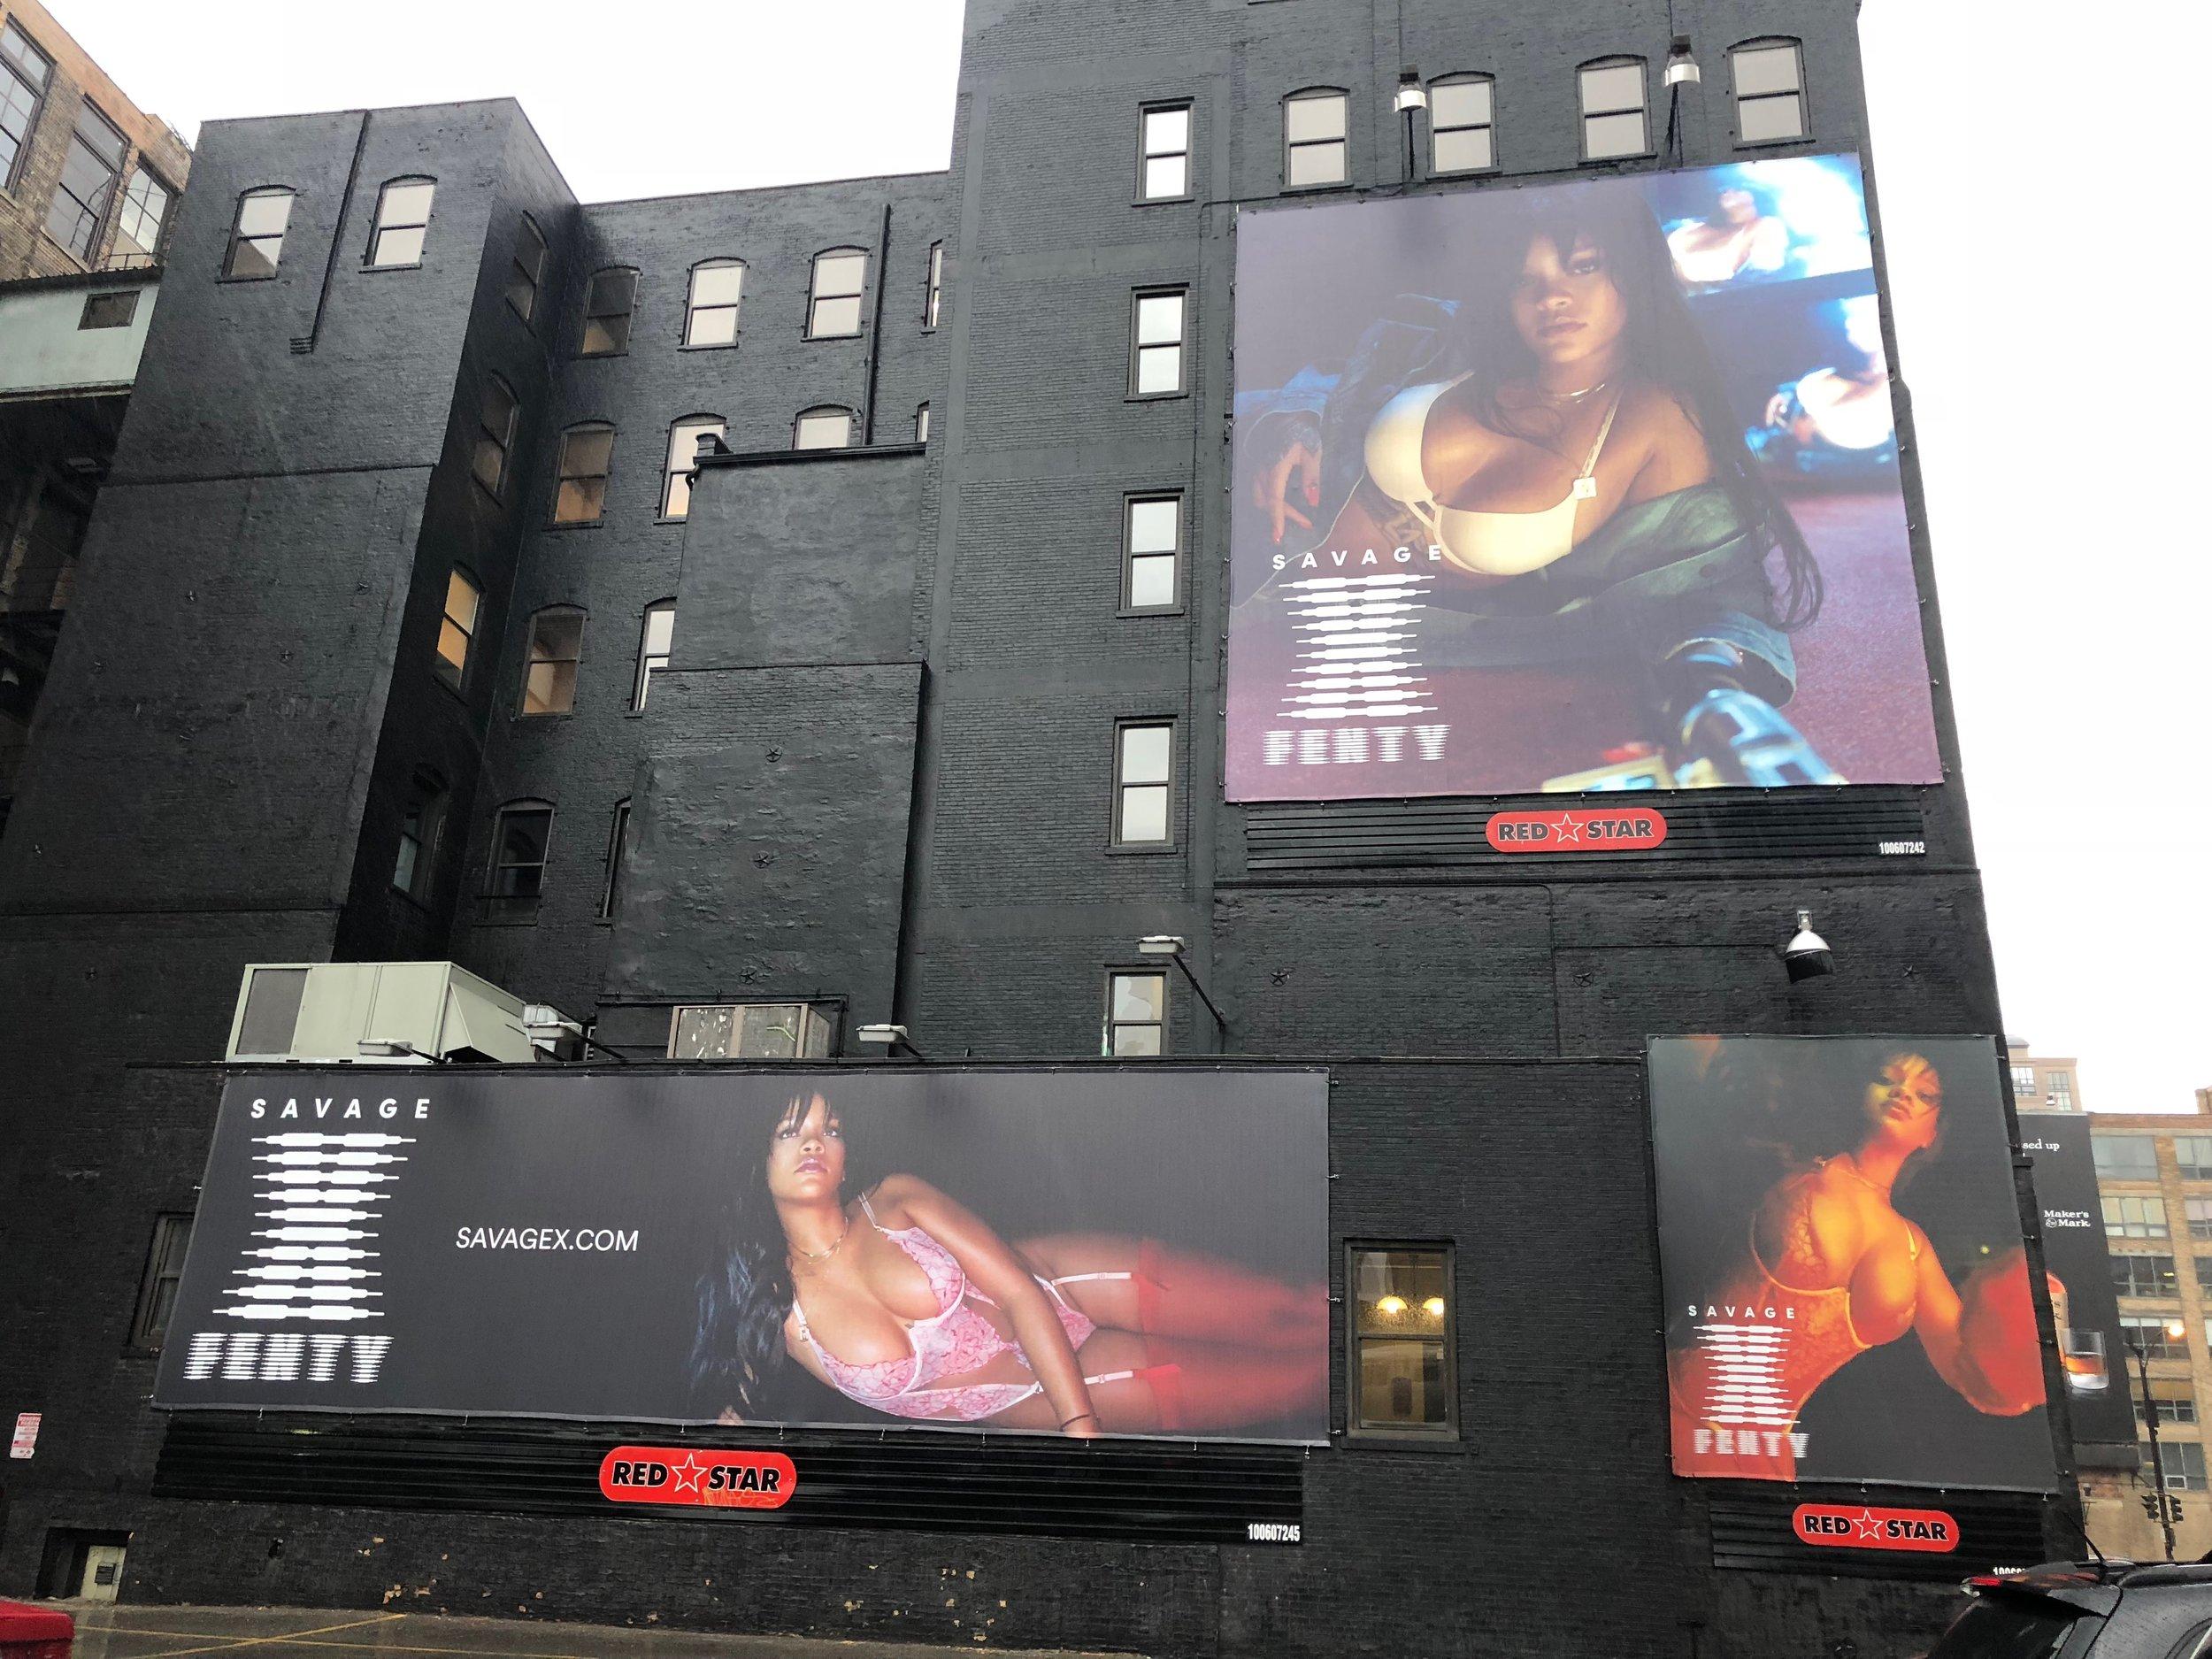 #202-204 Rihanna Fenty Savage - Install Photo (1).JPG